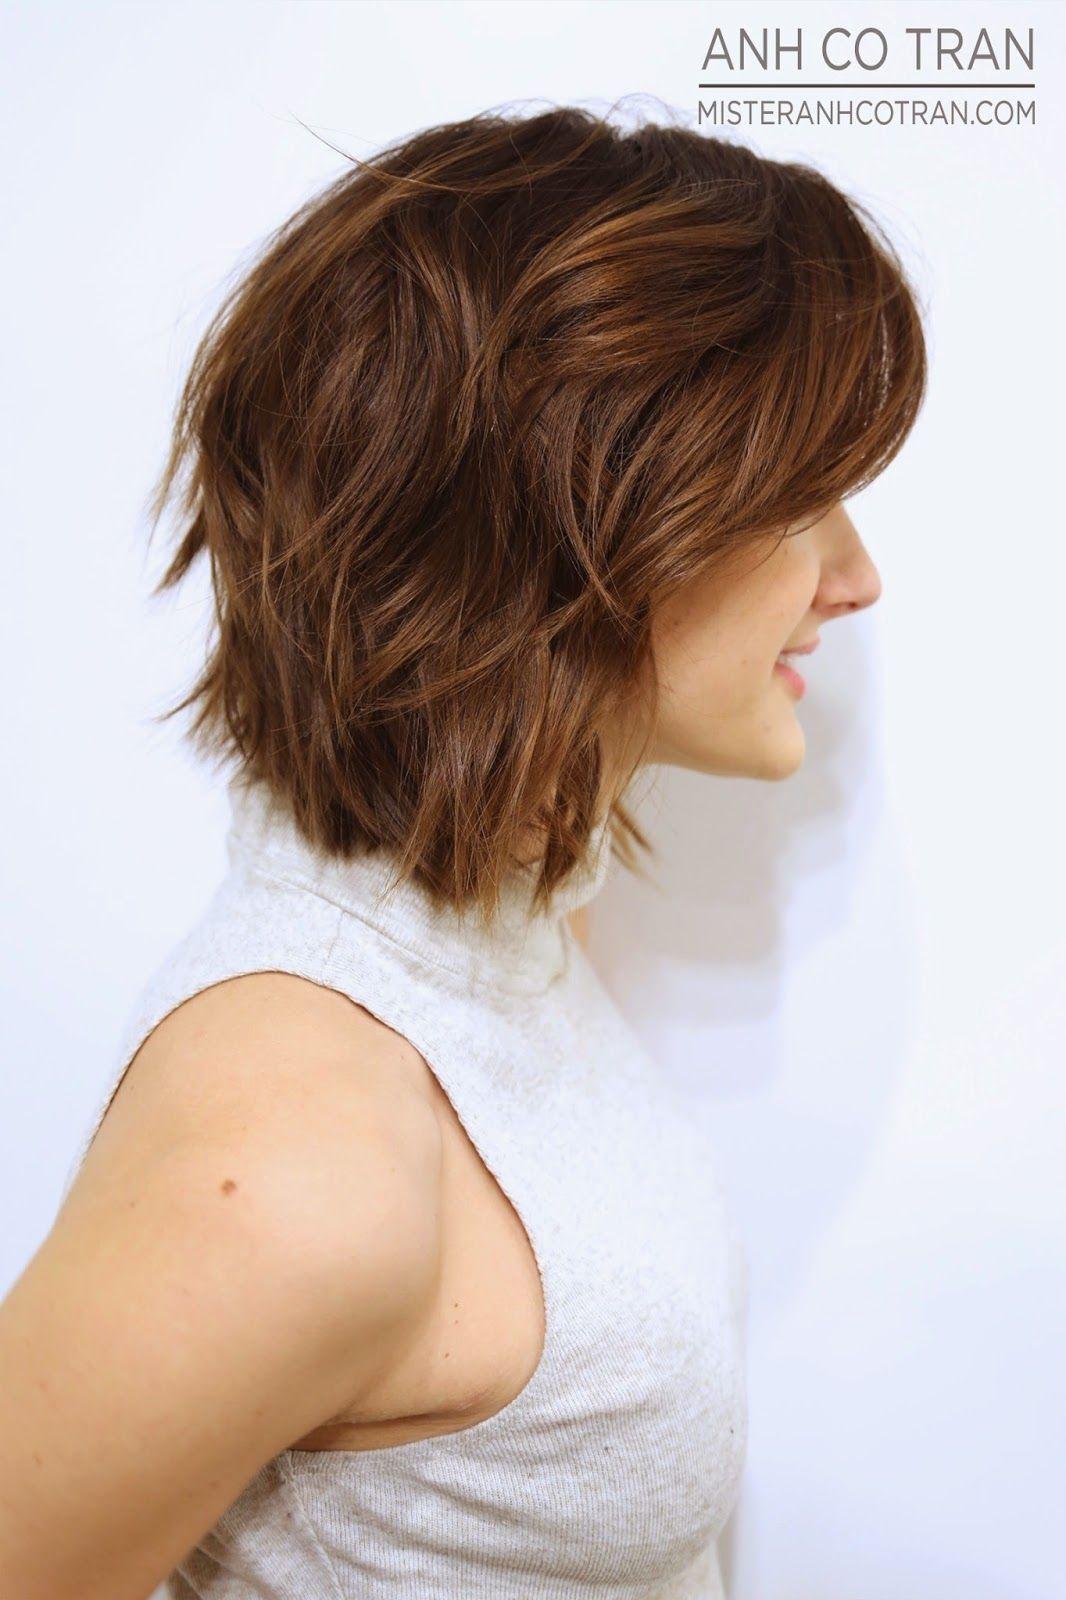 Mister anhcotran beautifully brunette soft undercut hair